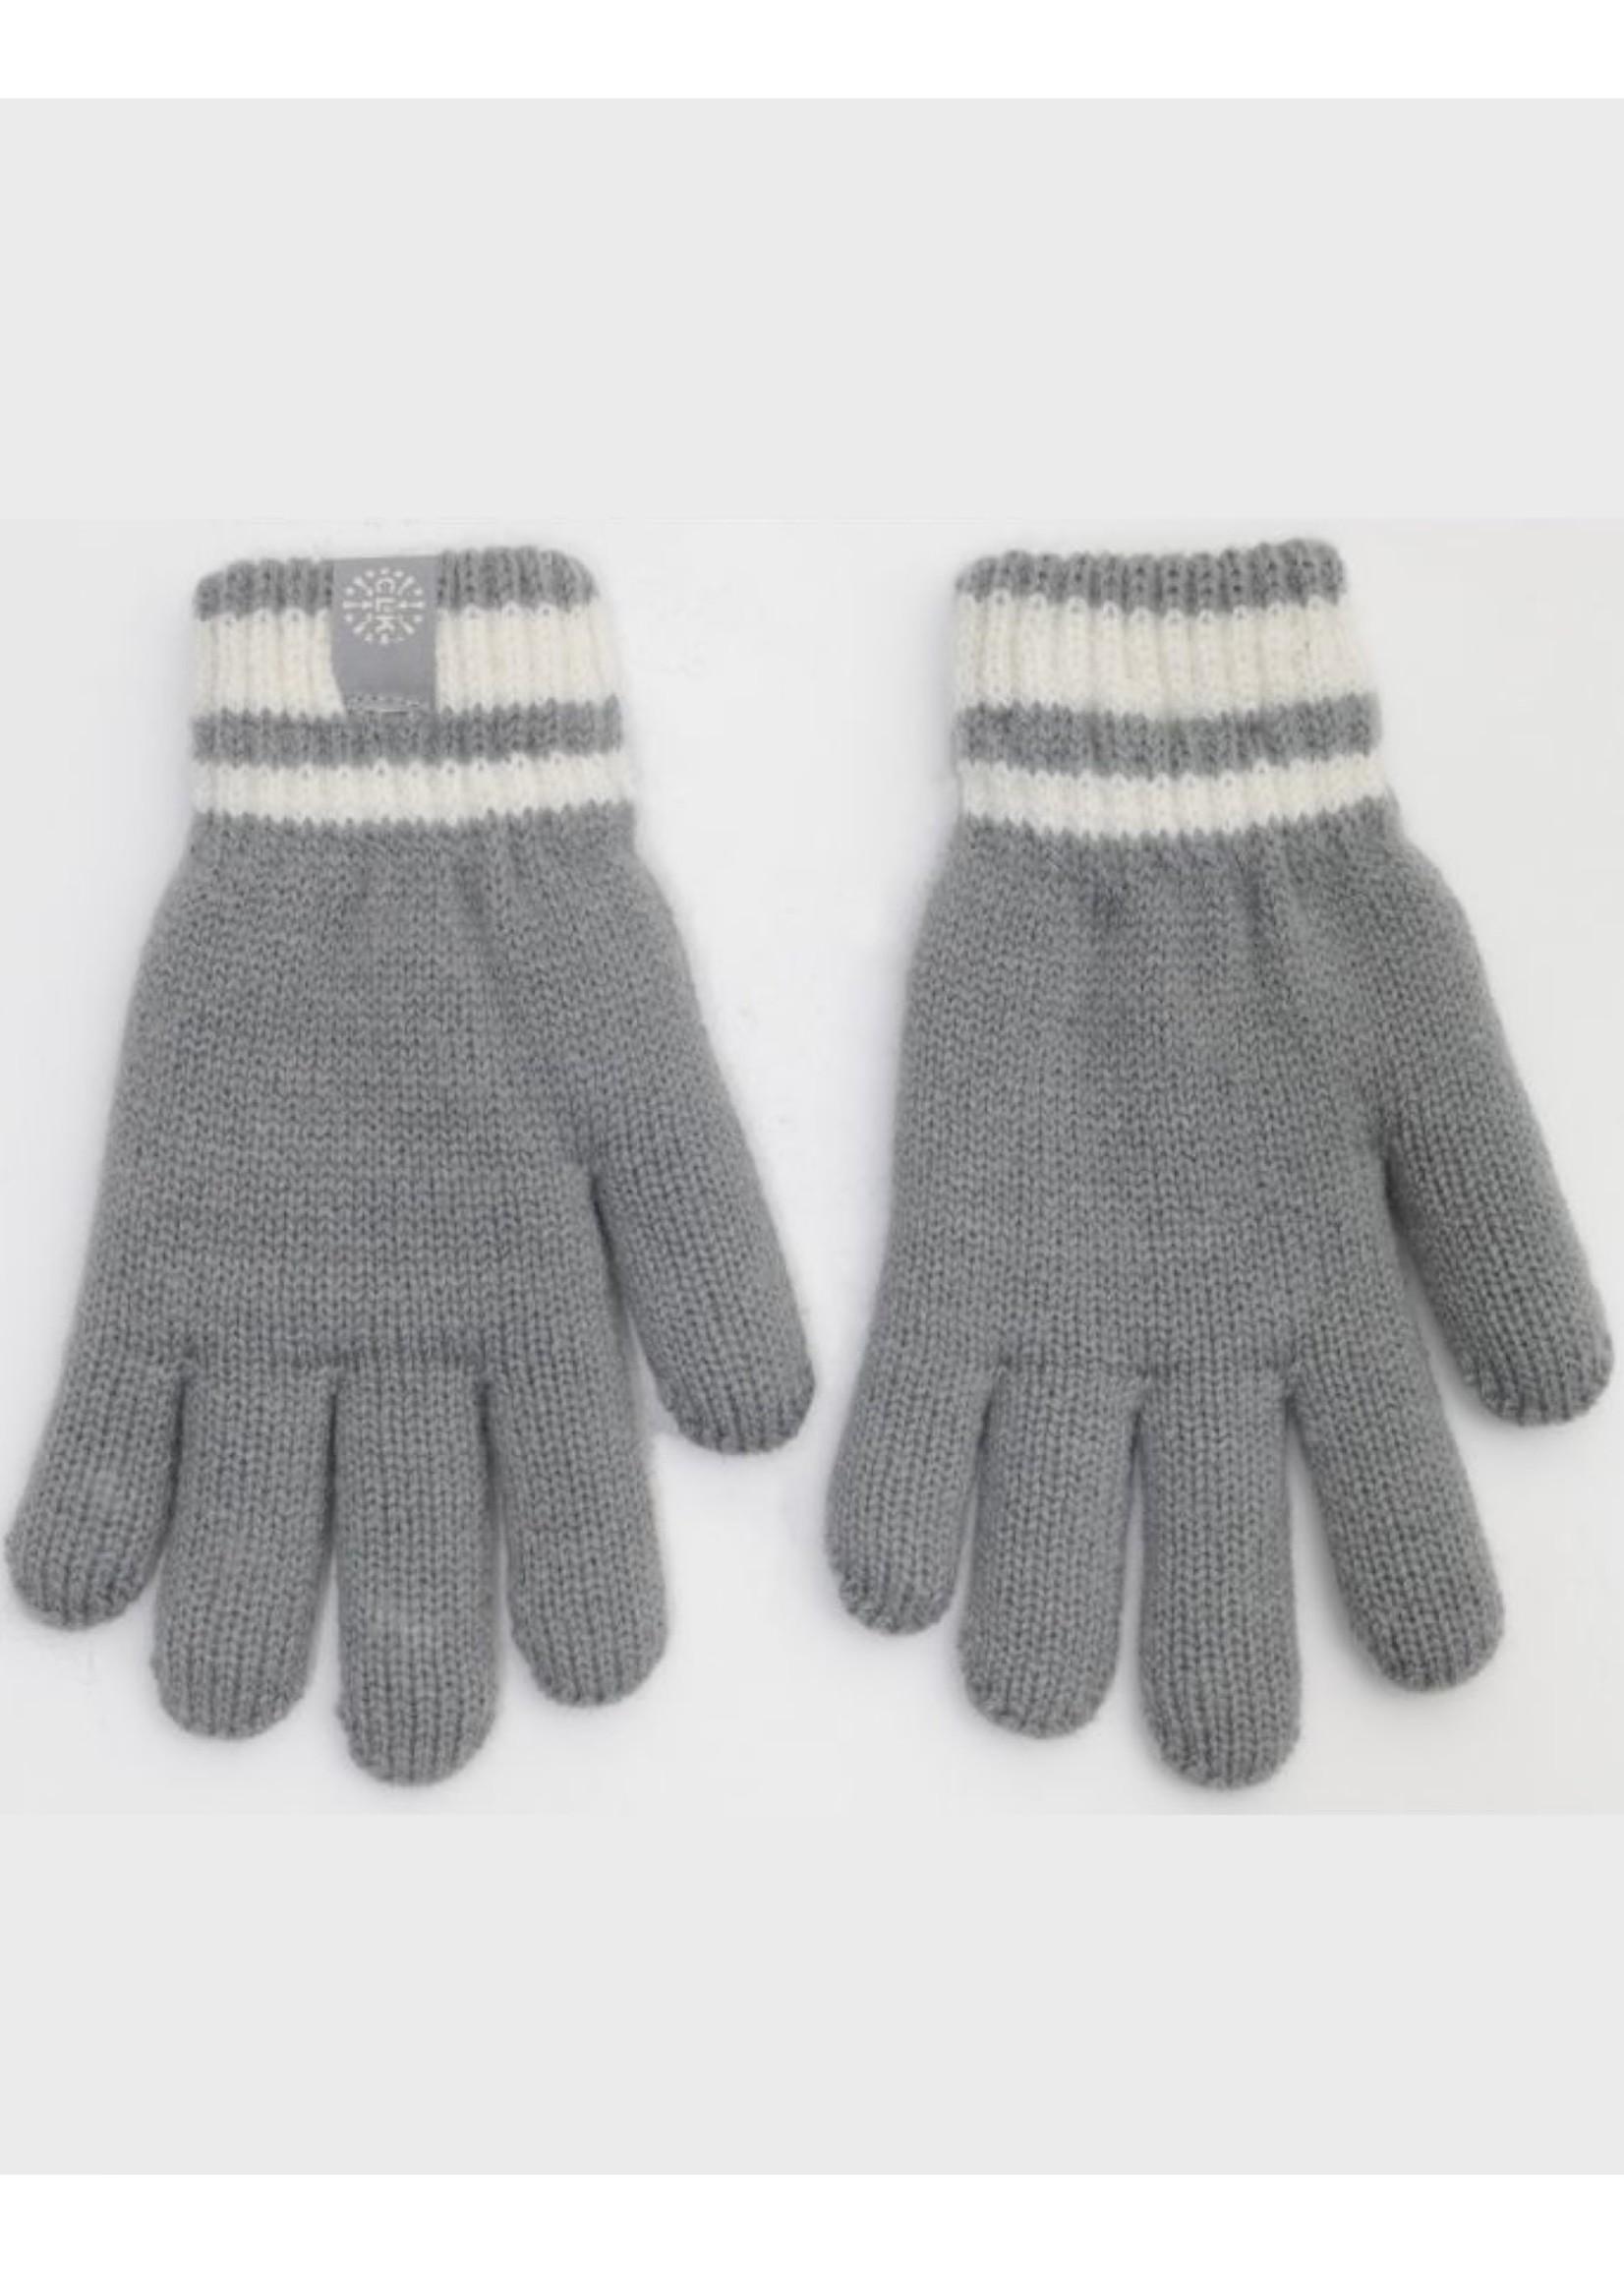 Calikids Calikids, Boys Knit Winter Gloves